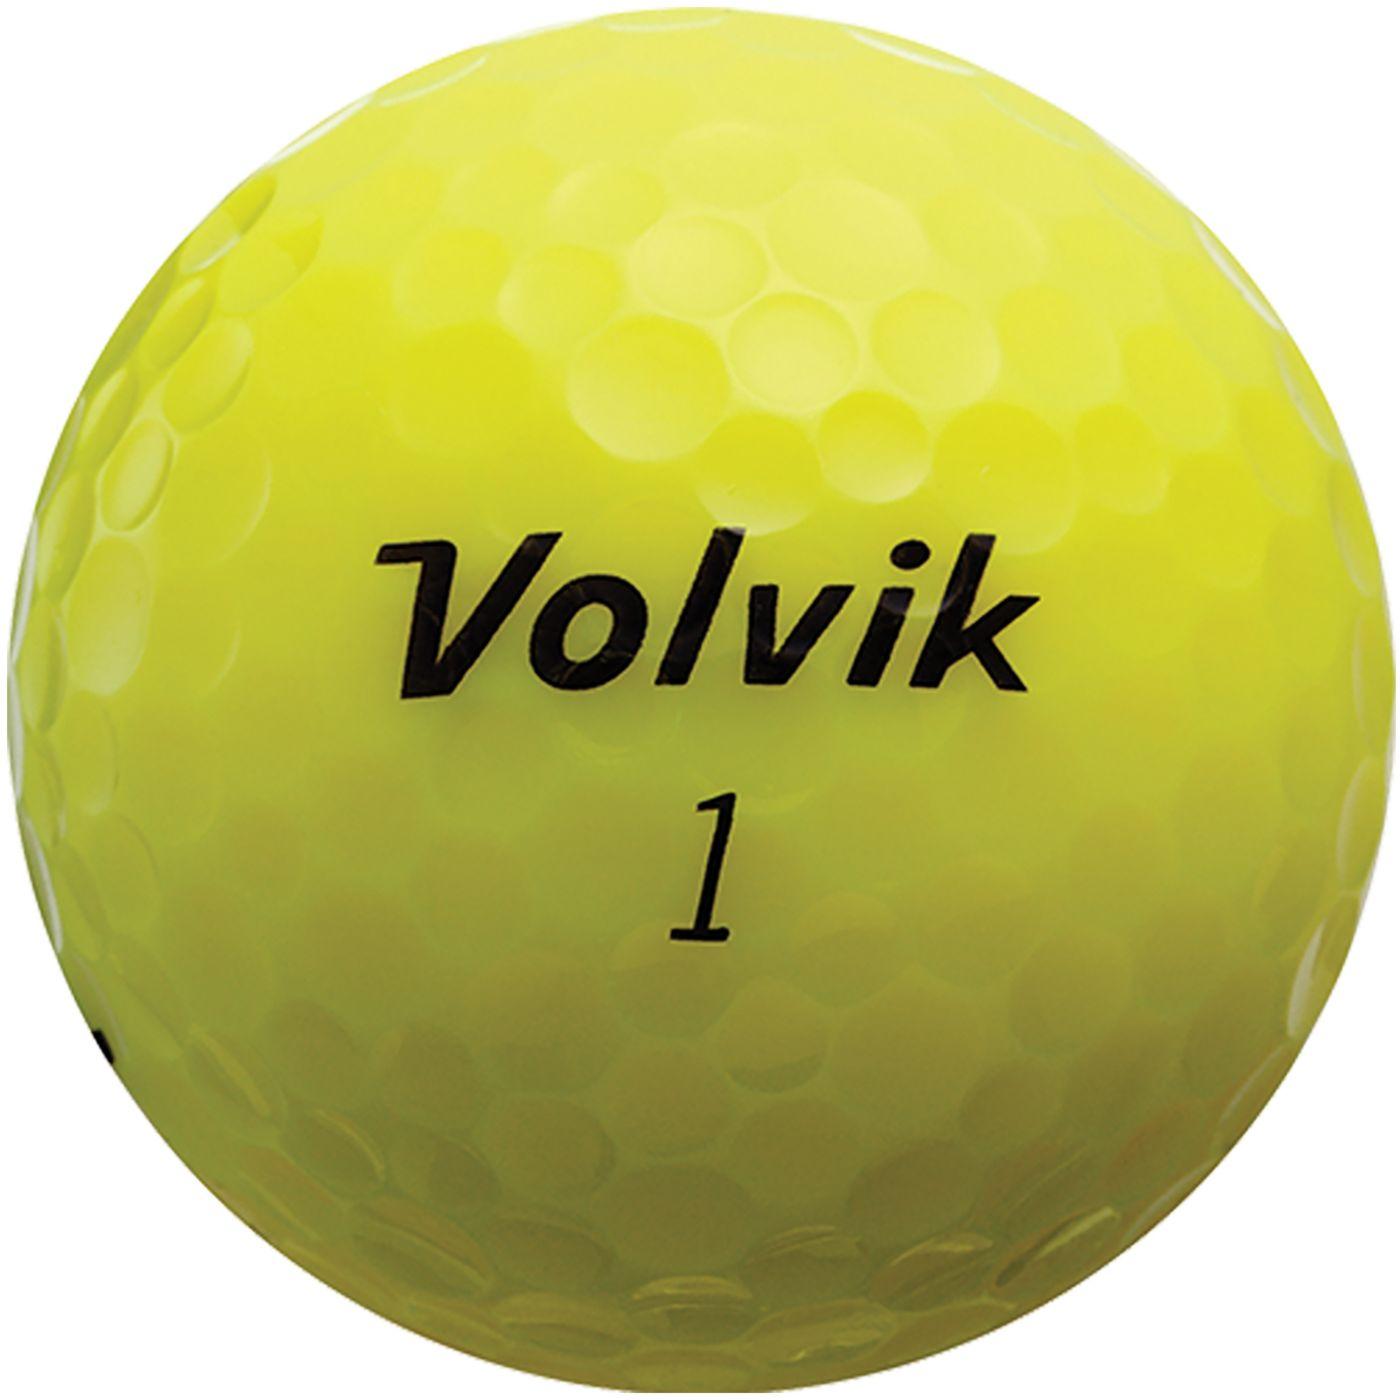 Volvik 2018 Crystal Yellow Golf Balls